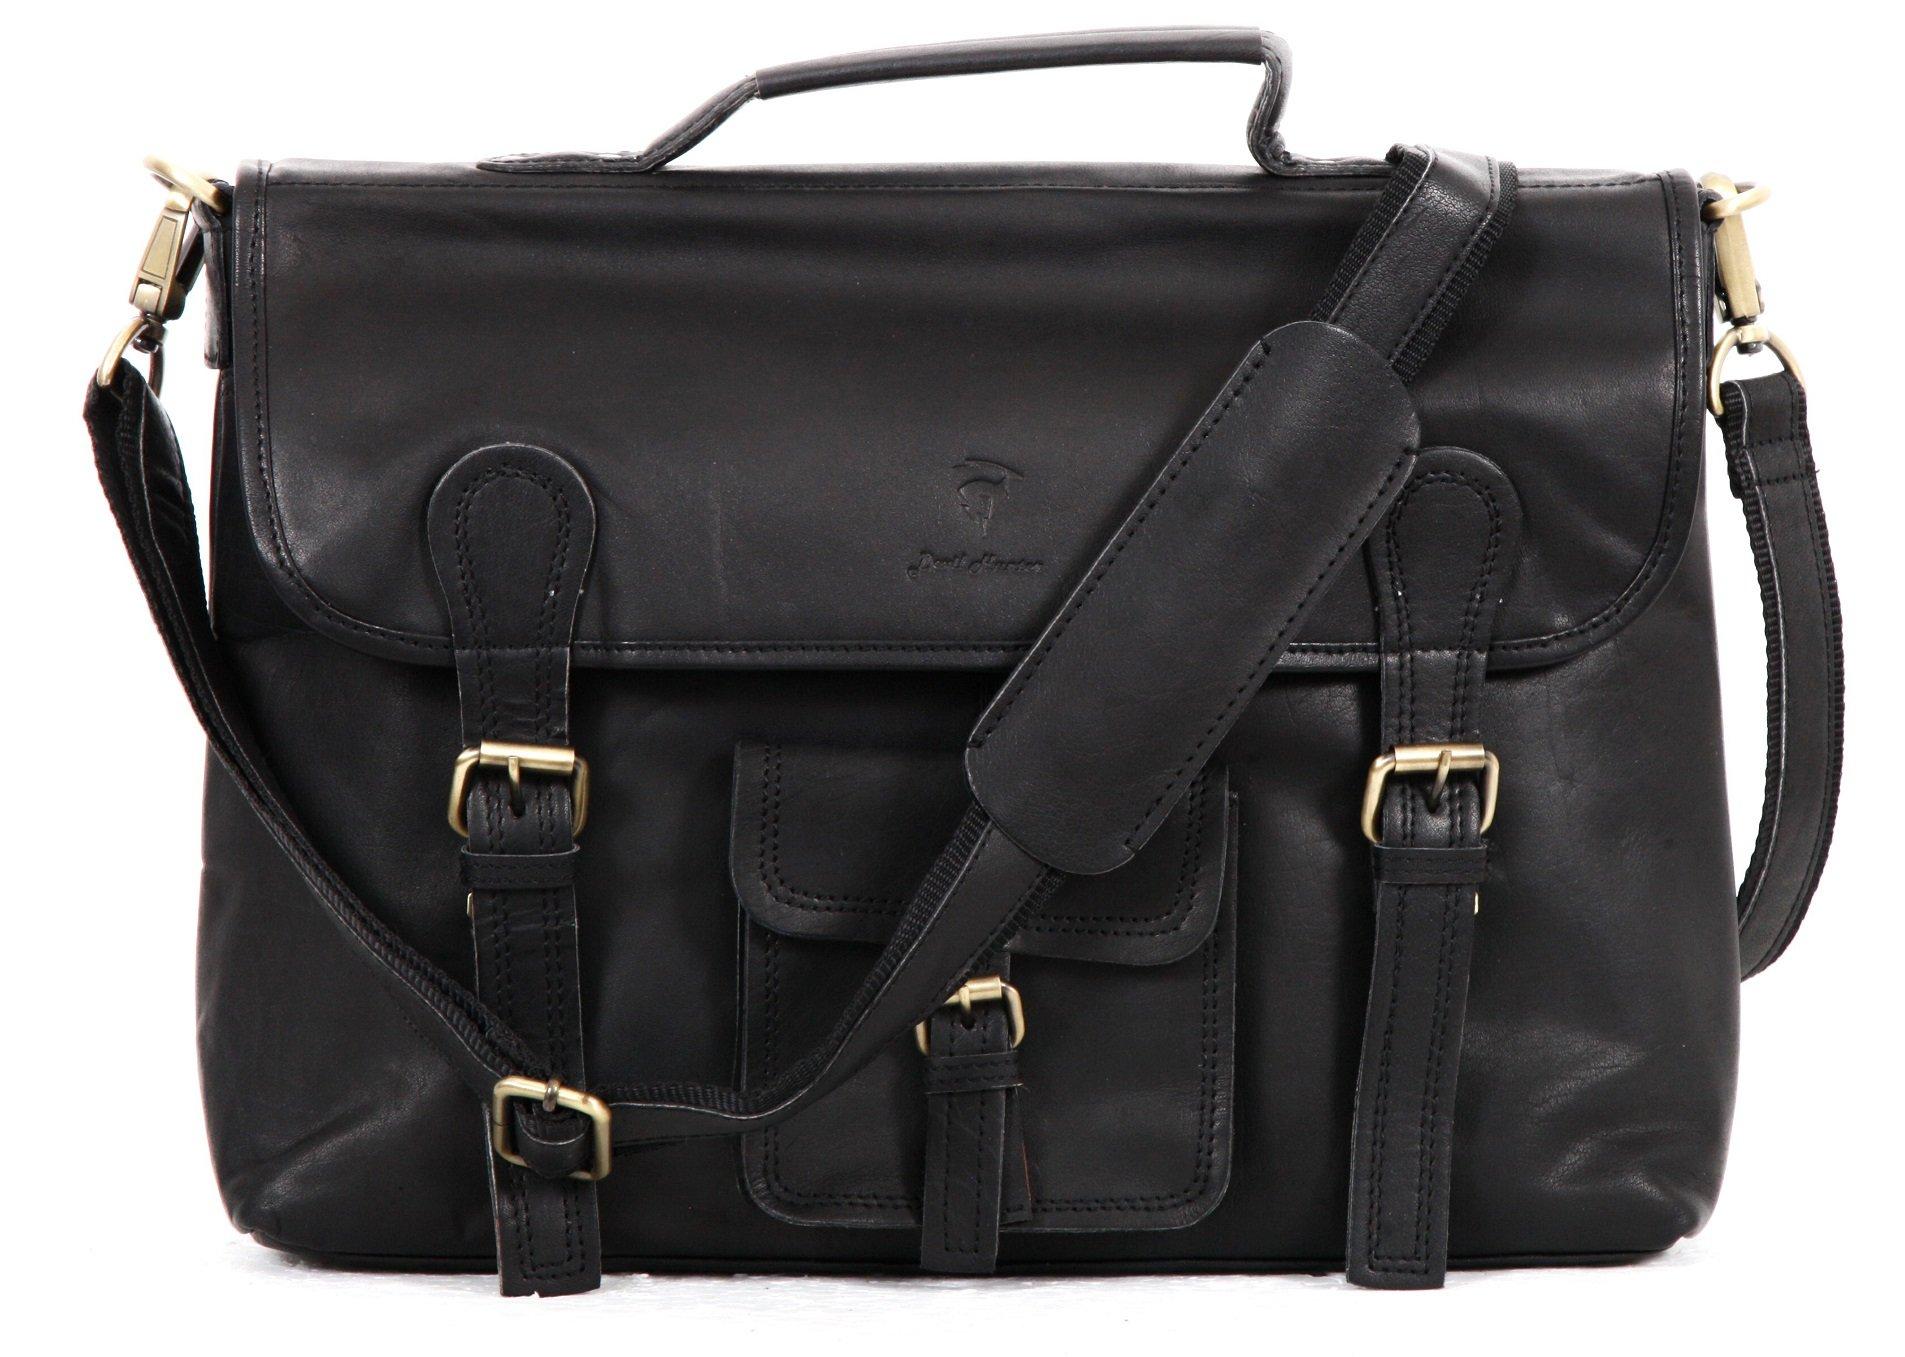 Devil Hunter DH Leather Unisex Real Leather Messenger Bag for Laptop Briefcase Satchel